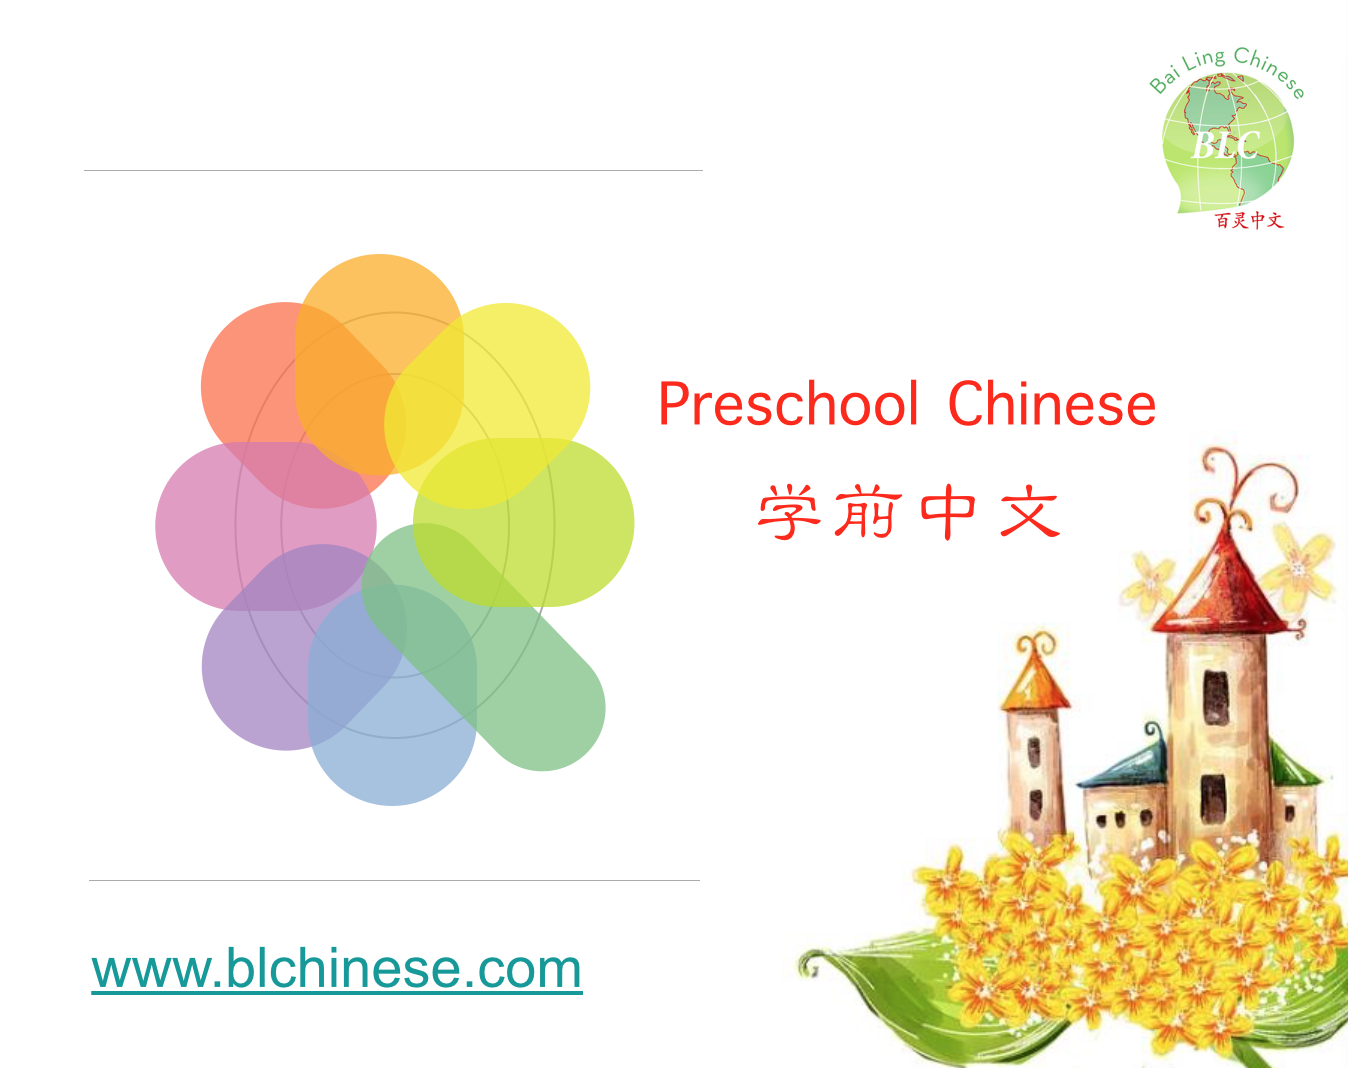 Preschool Chinese